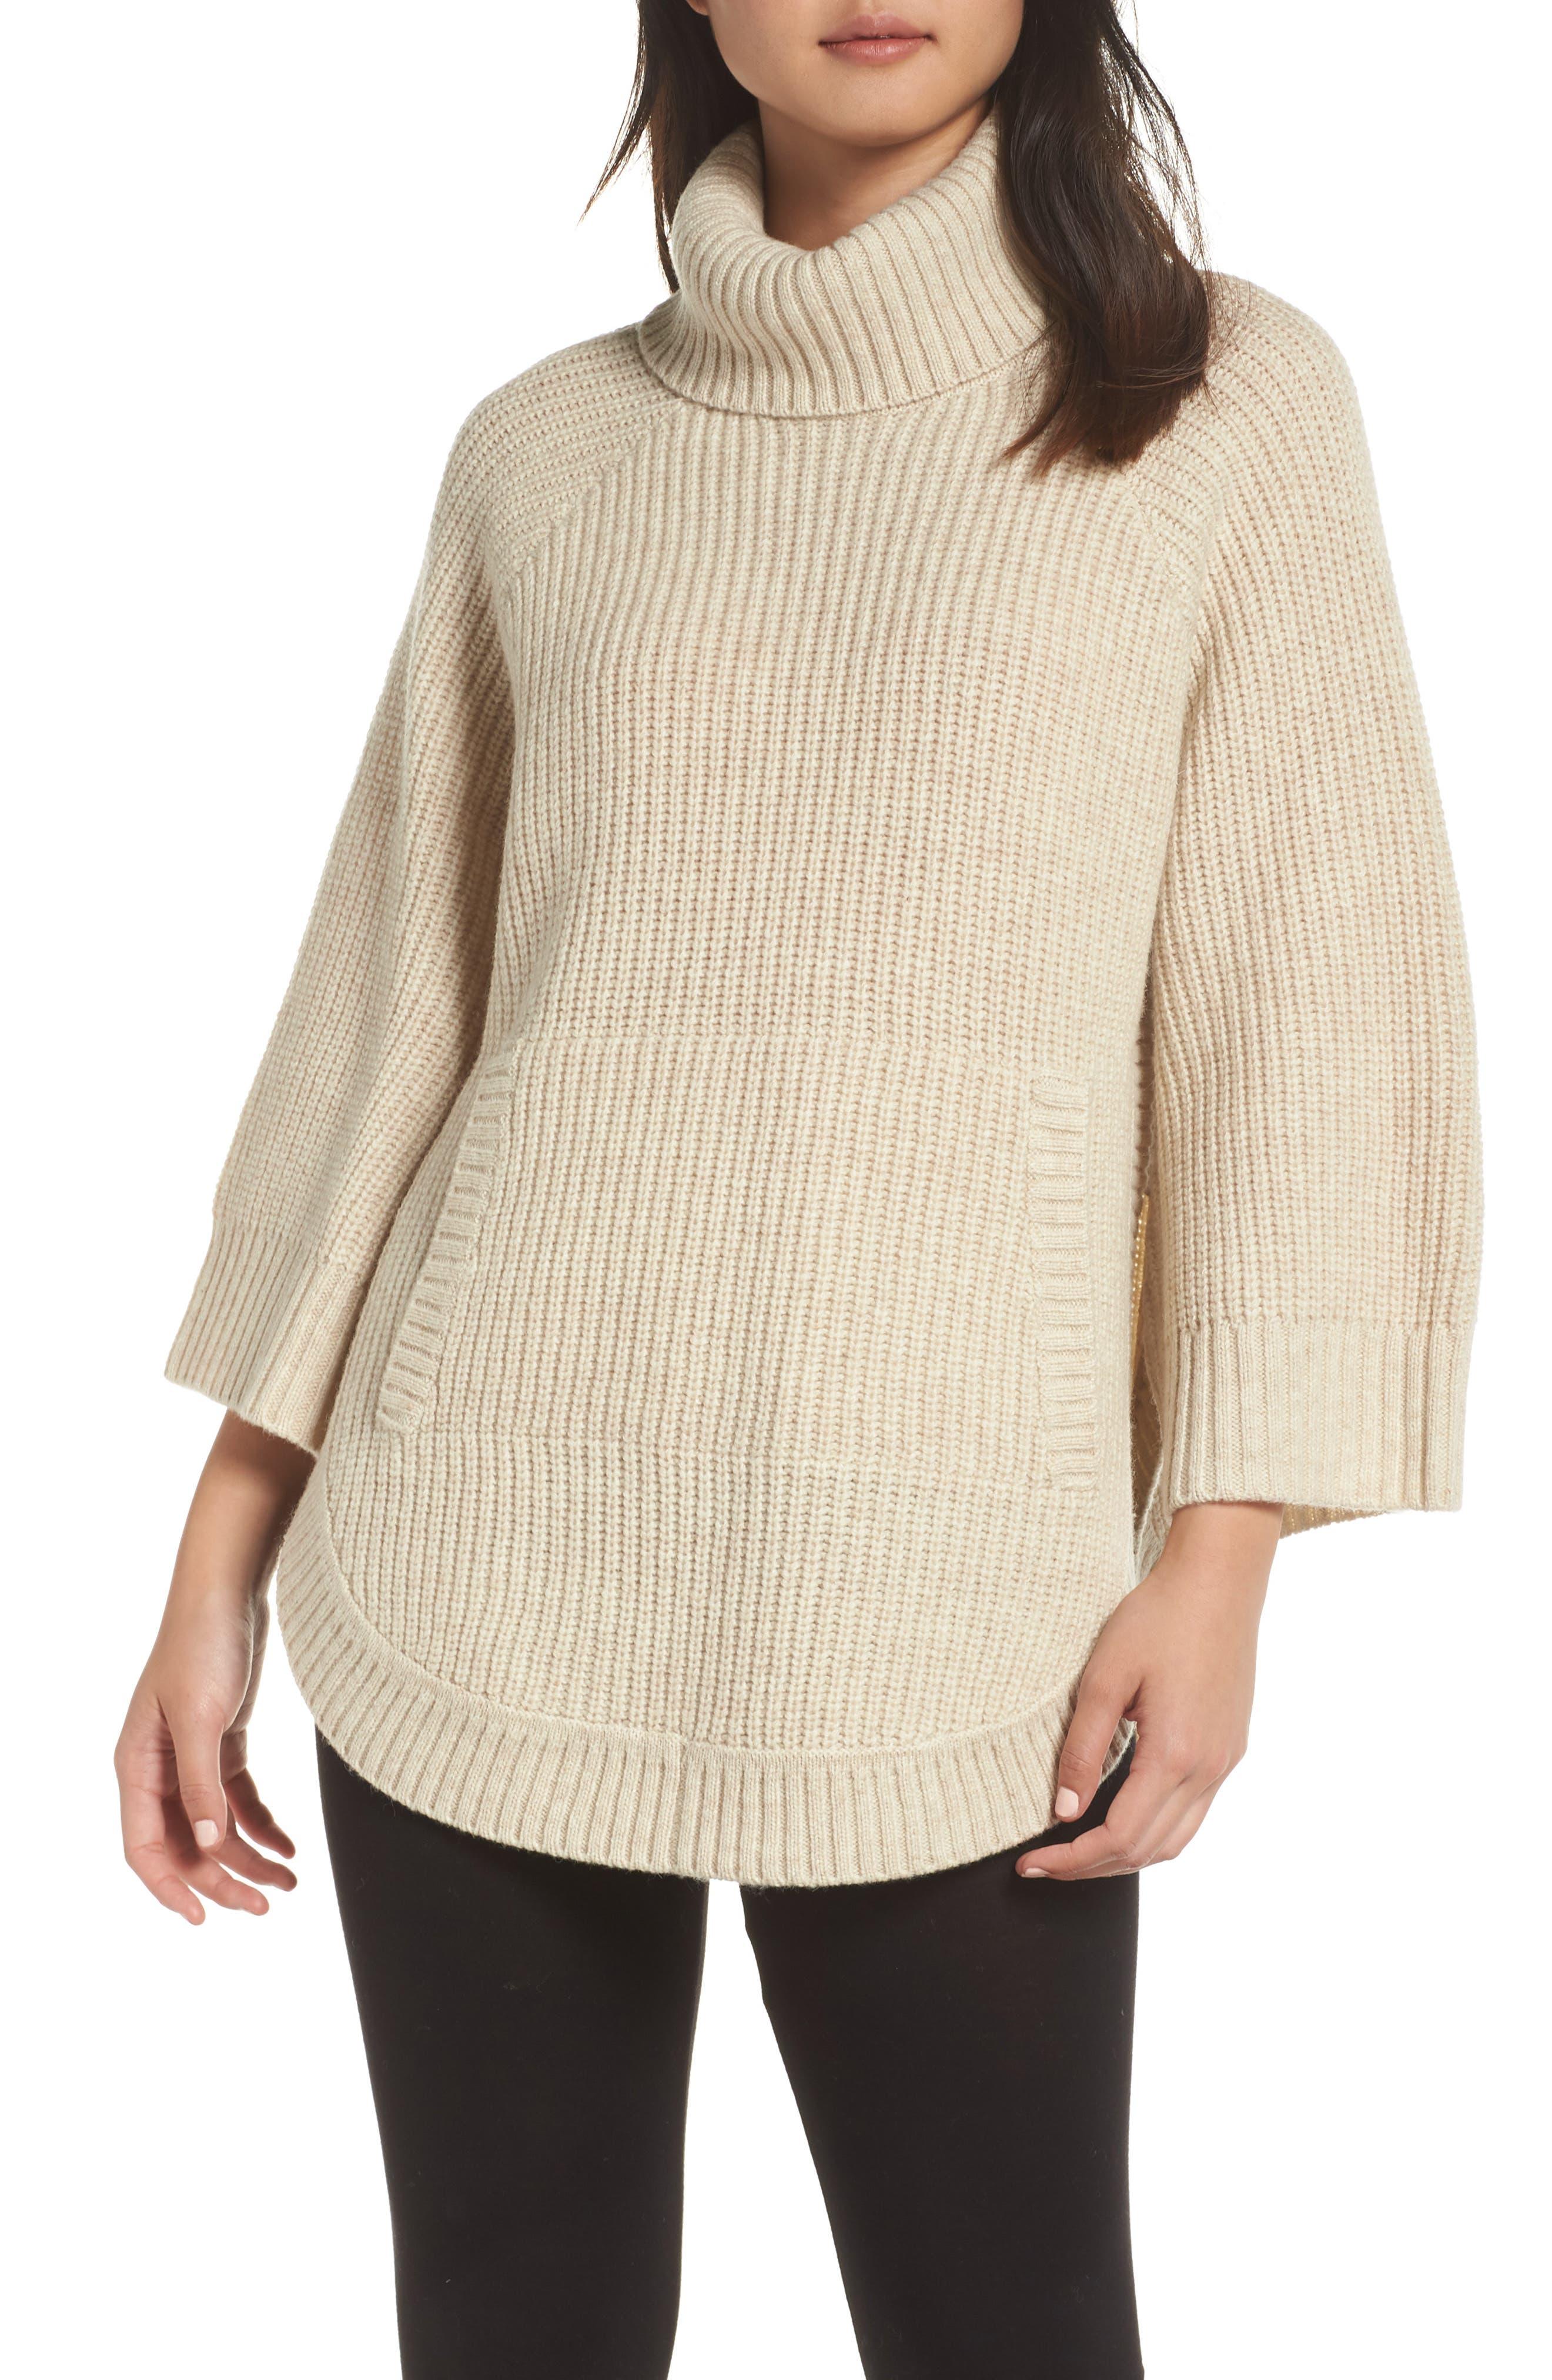 Raelynn Turtleneck Sweater in Cream Heather